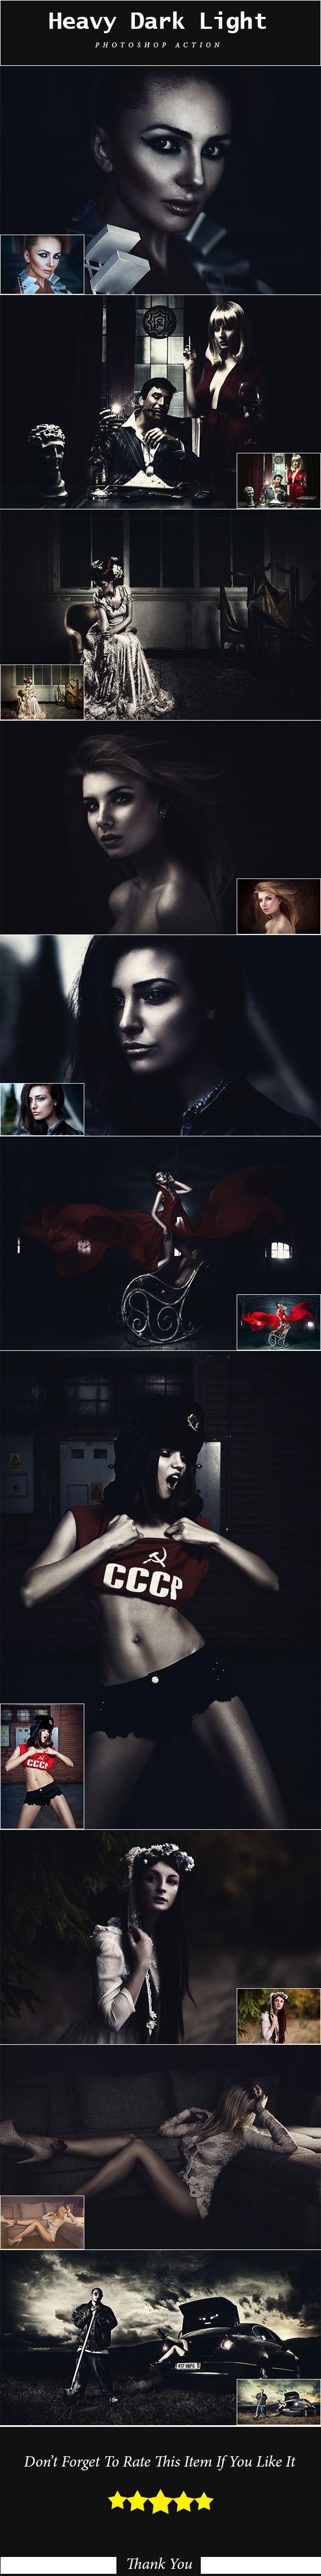 Heavy Dark Light Photoshop Action. Download here: https://graphicriver.net/item/heavy-dark-light-ps-action/17307277?ref=ksioks